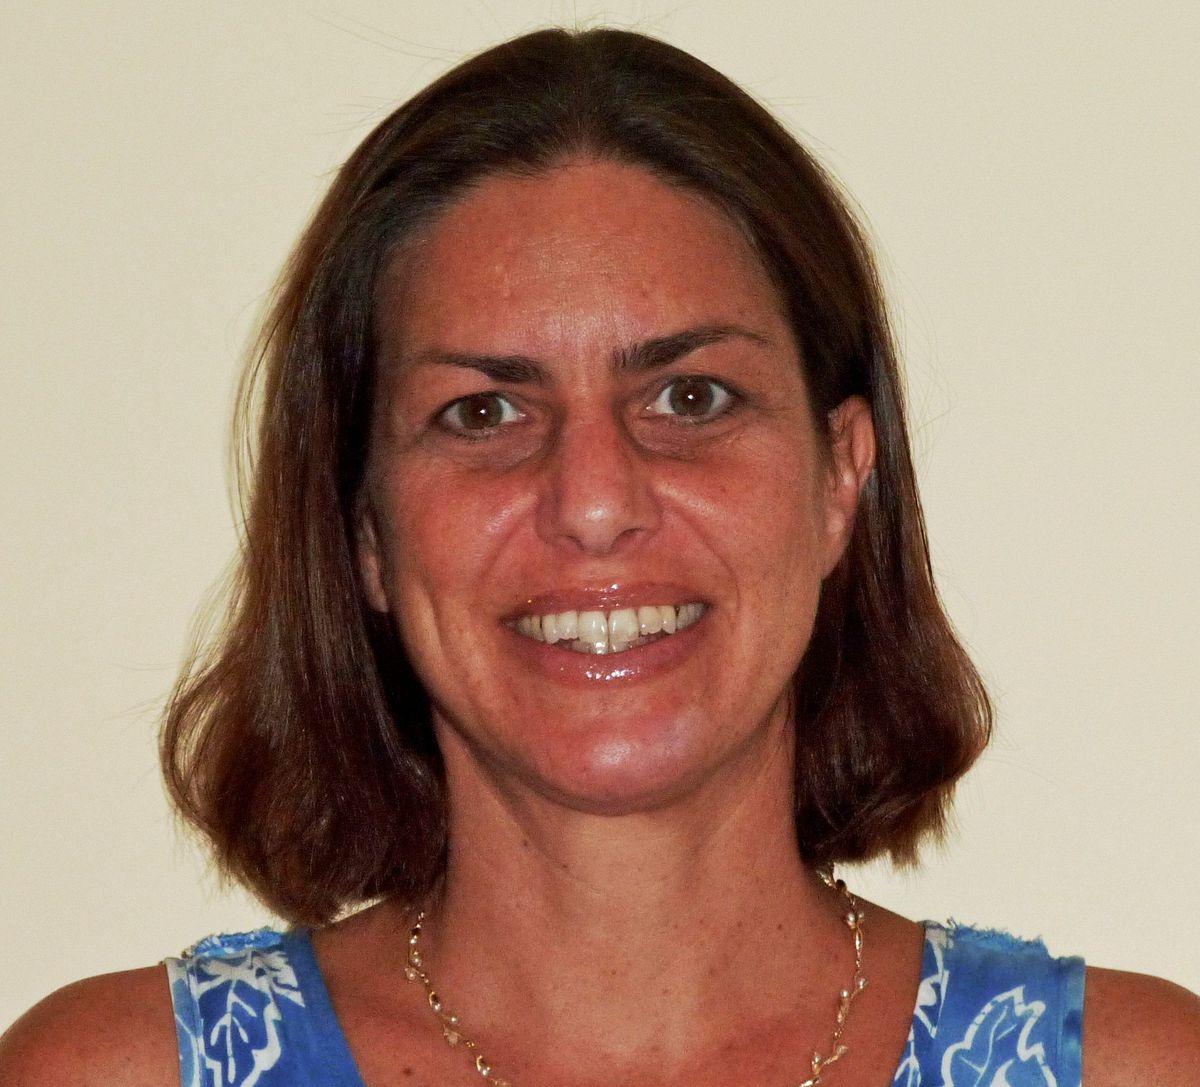 Marlena Fejzo